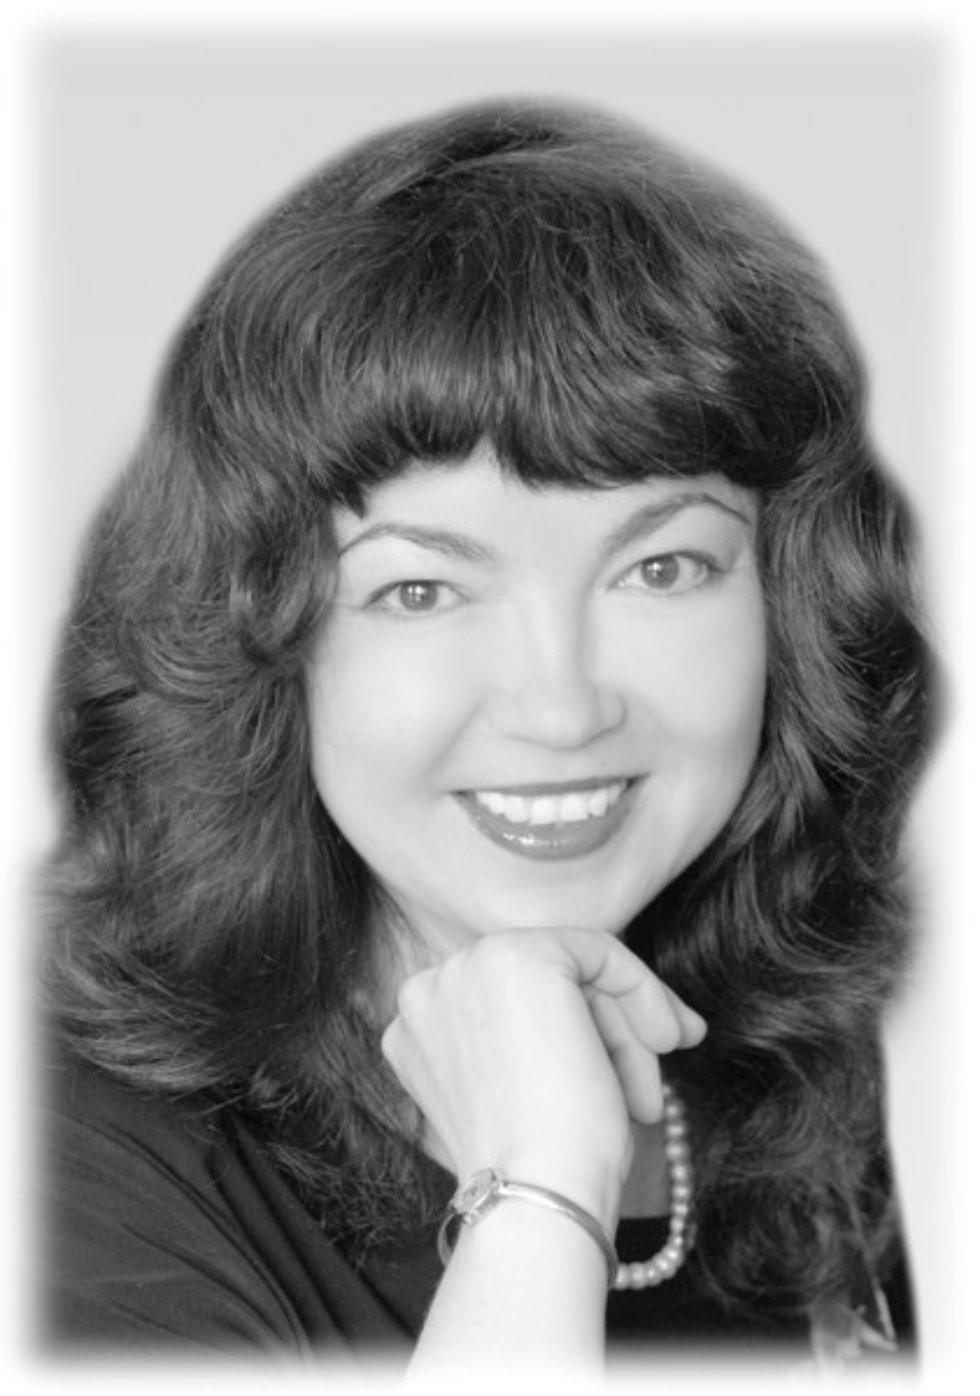 KireevaKarimova Alfiya Muratovna